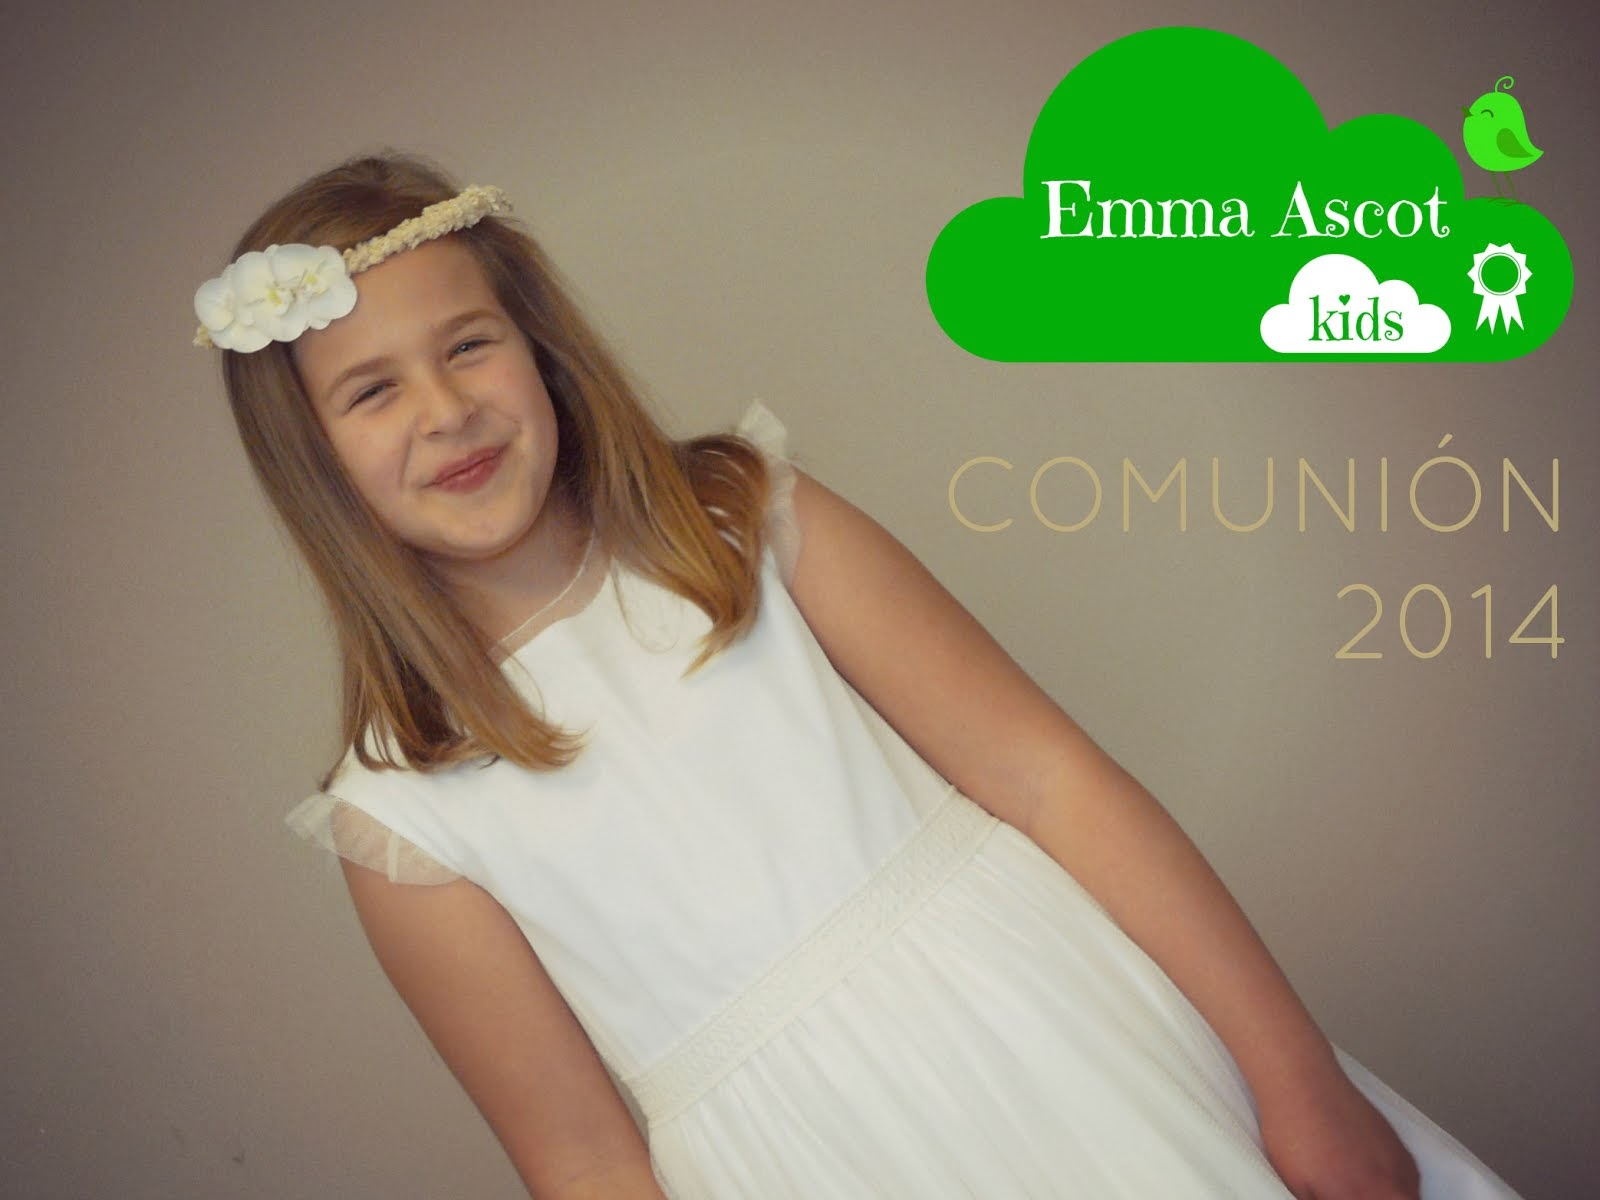 Emma Ascot kids